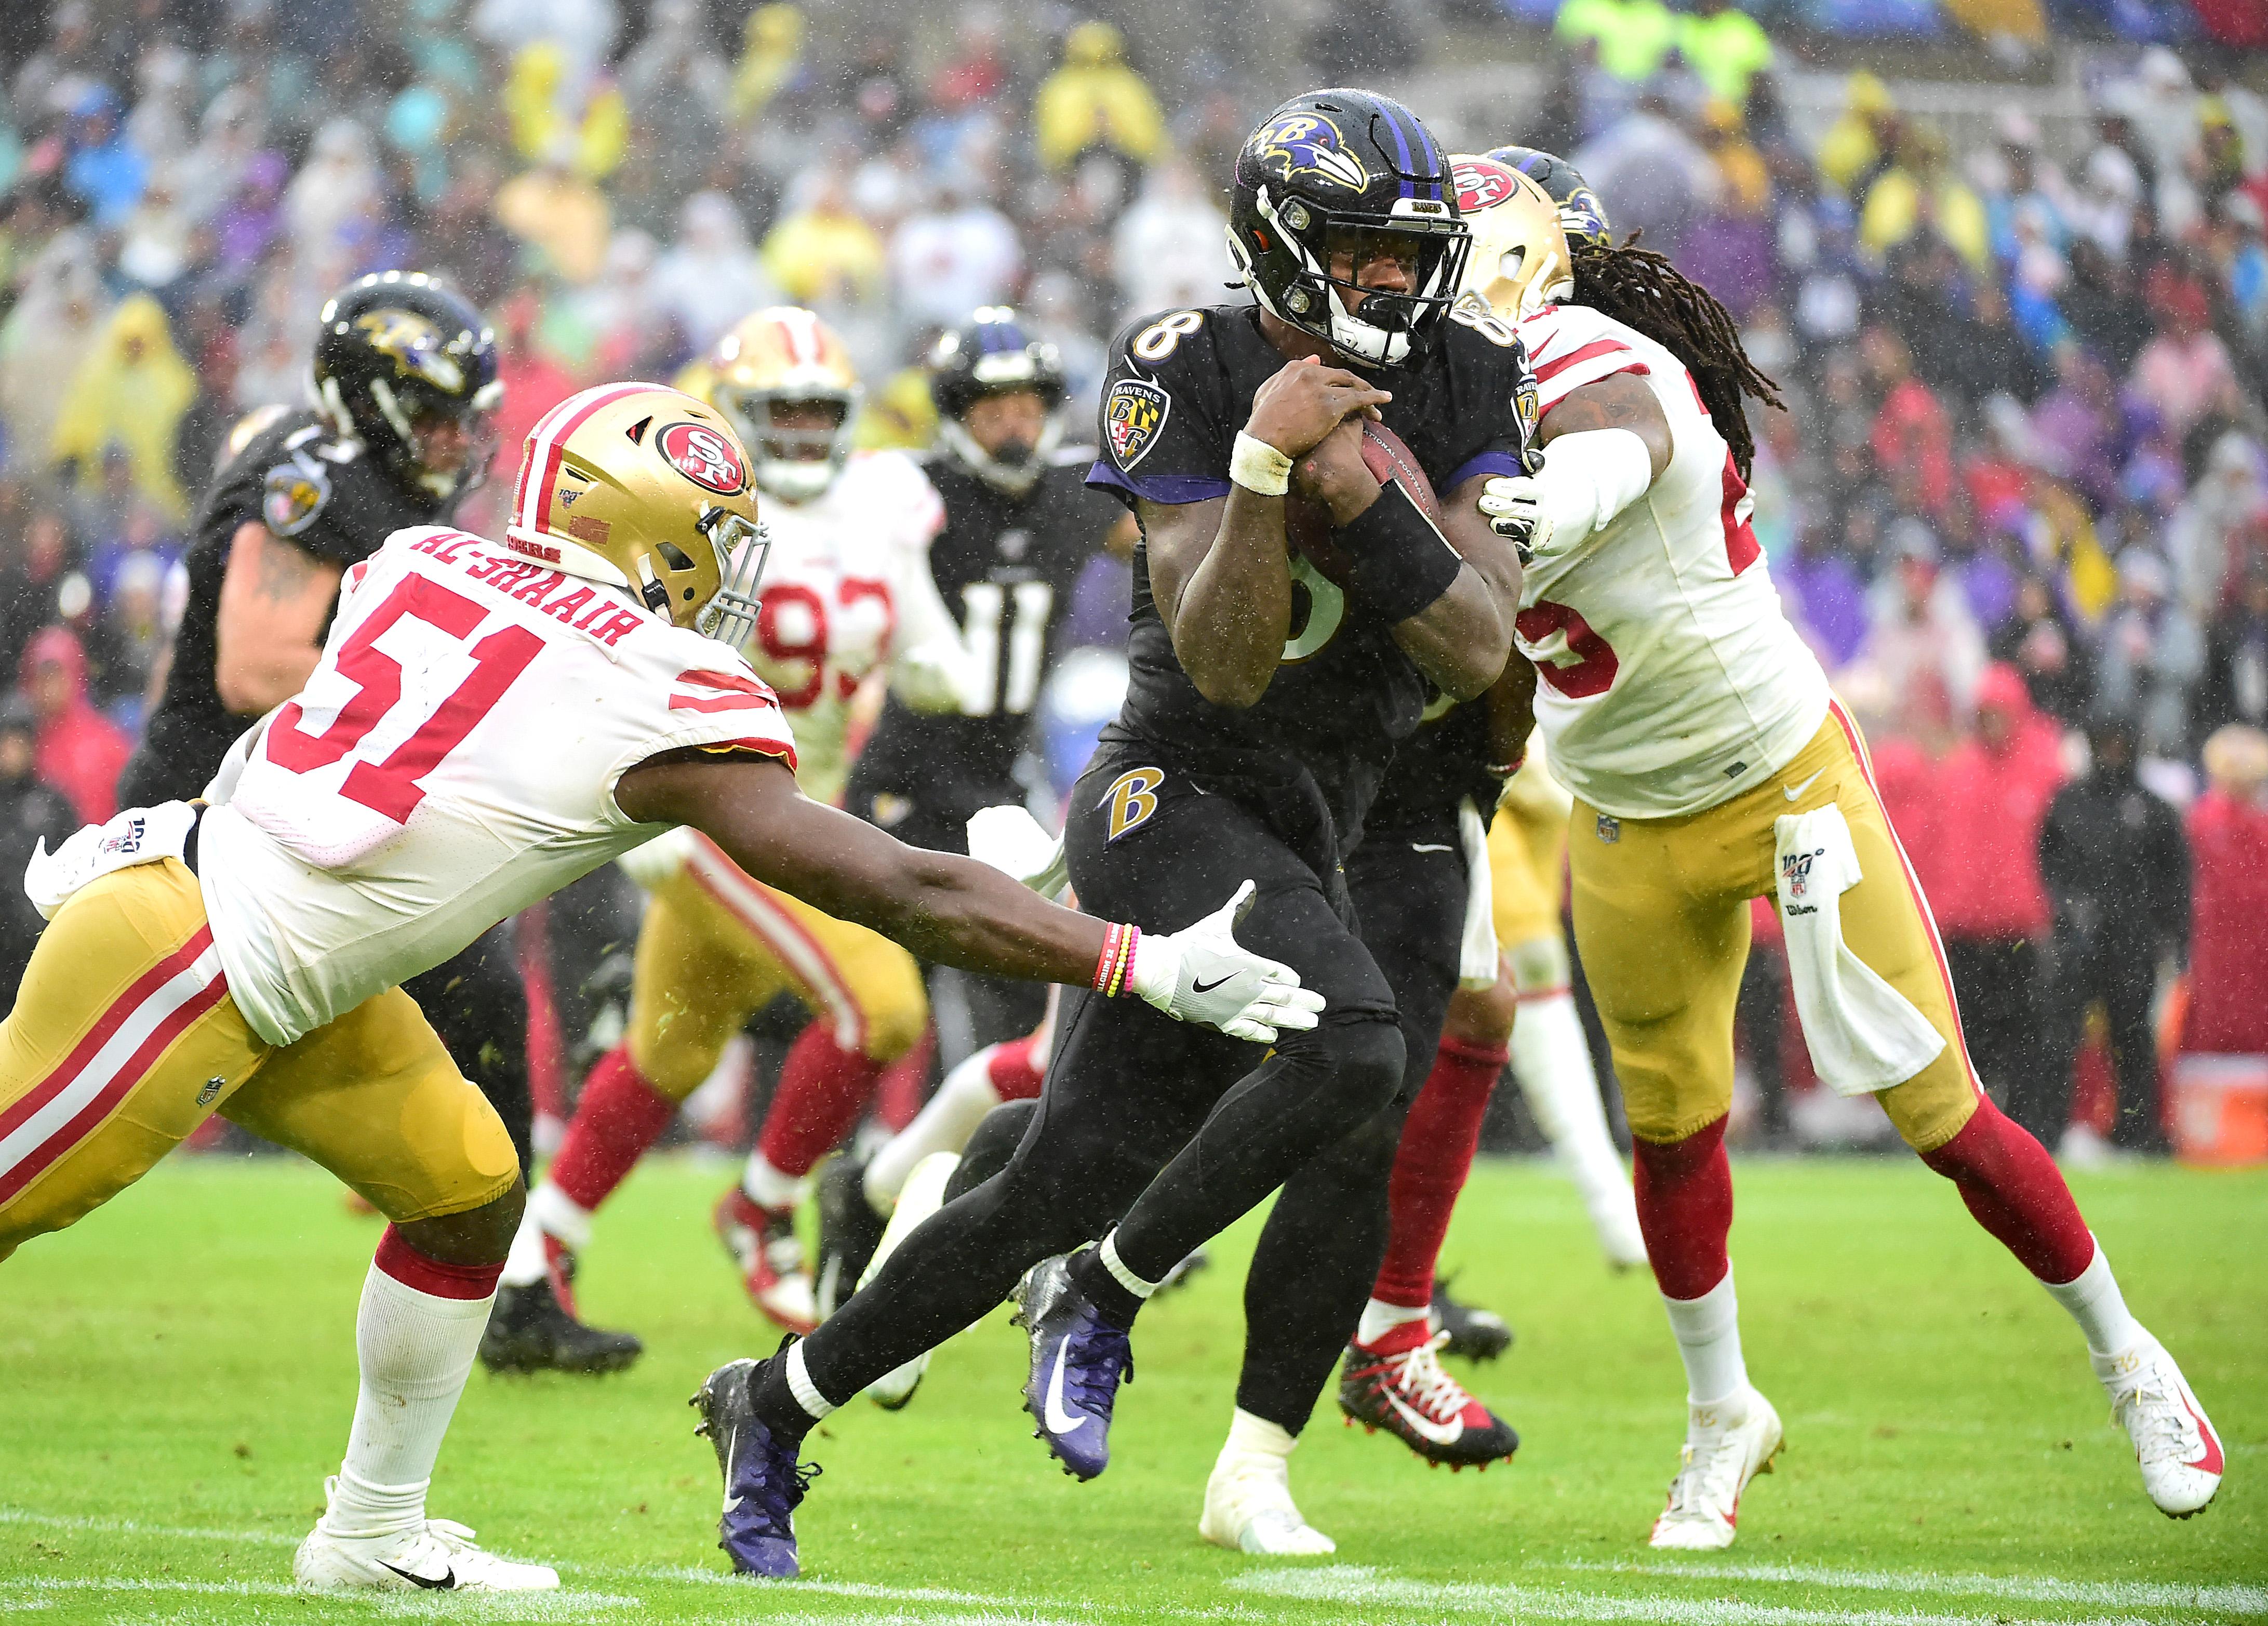 NFL: San Francisco 49ers at Baltimore Ravens